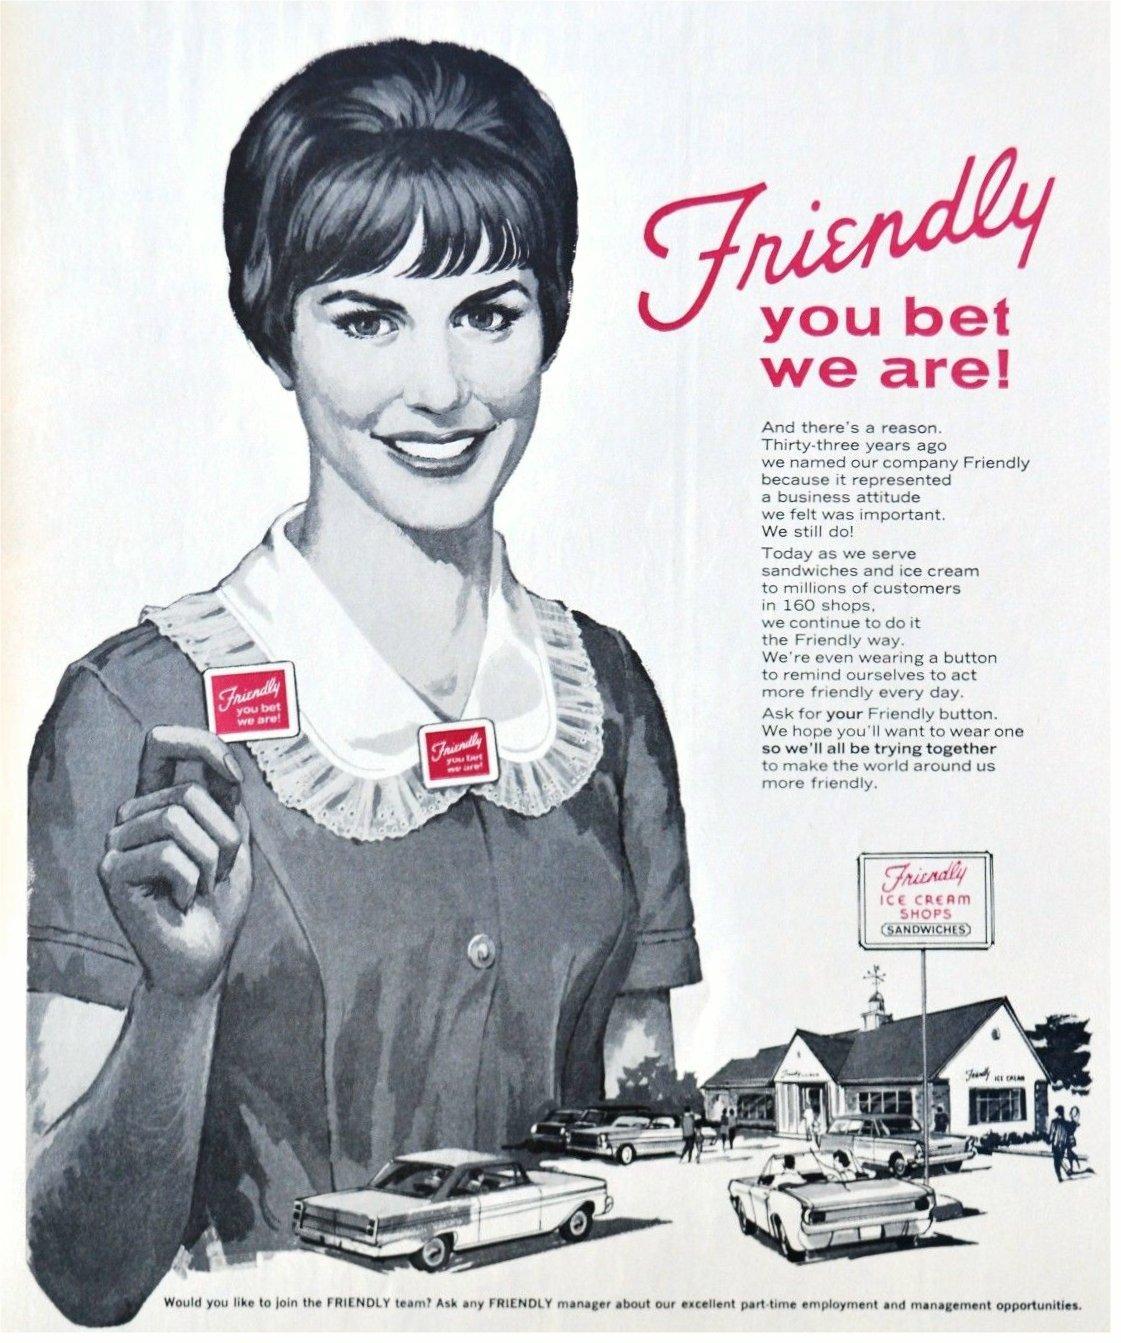 Friendly Ice Cream Shops - 1966